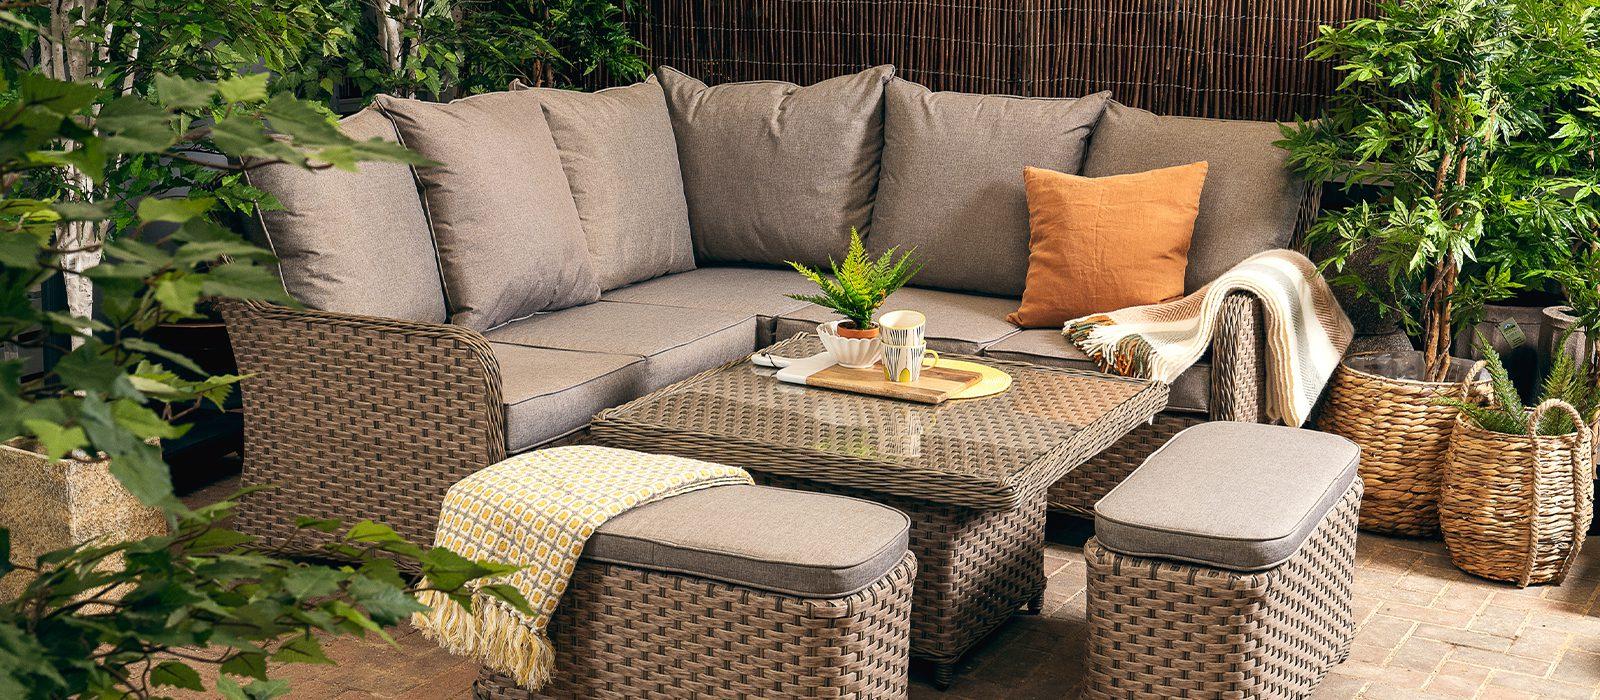 Yarnton Home & Garden, Kidlington, Oxford - Garden Furniture